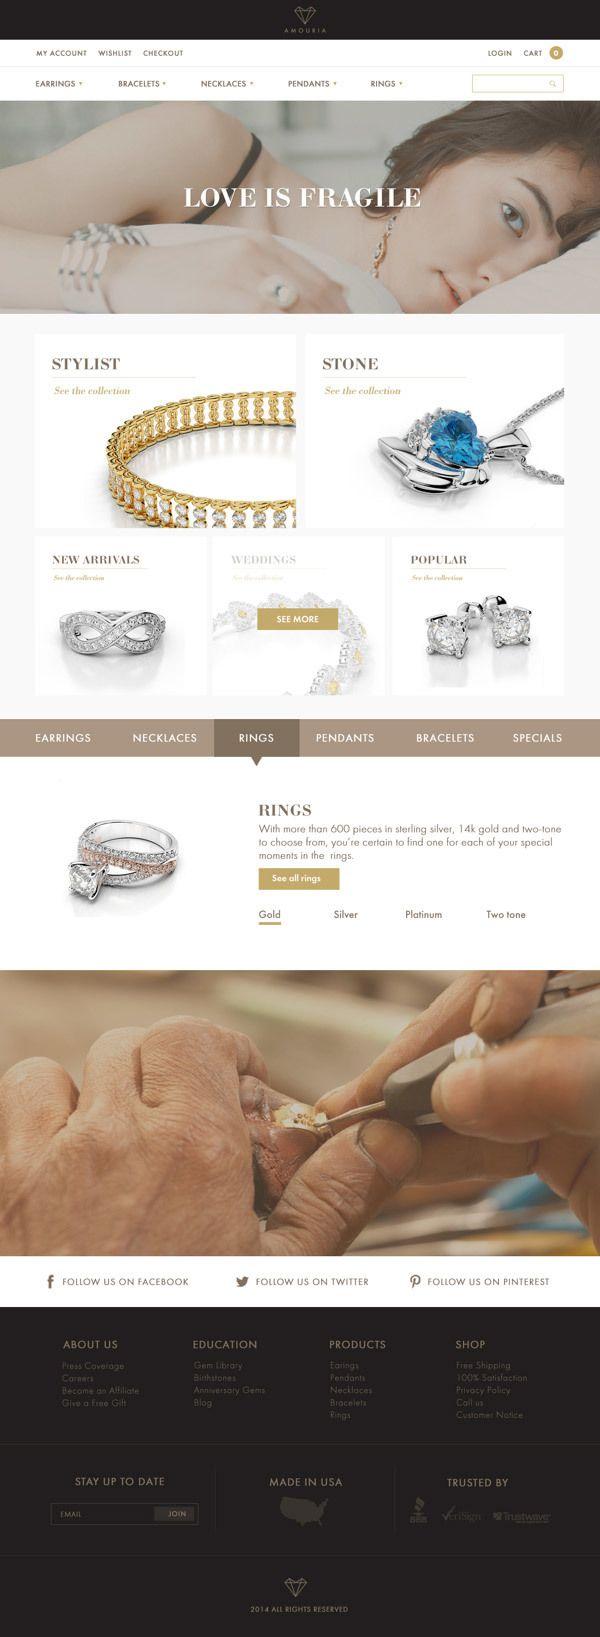 Amouria jewelry website design on Web Design Served